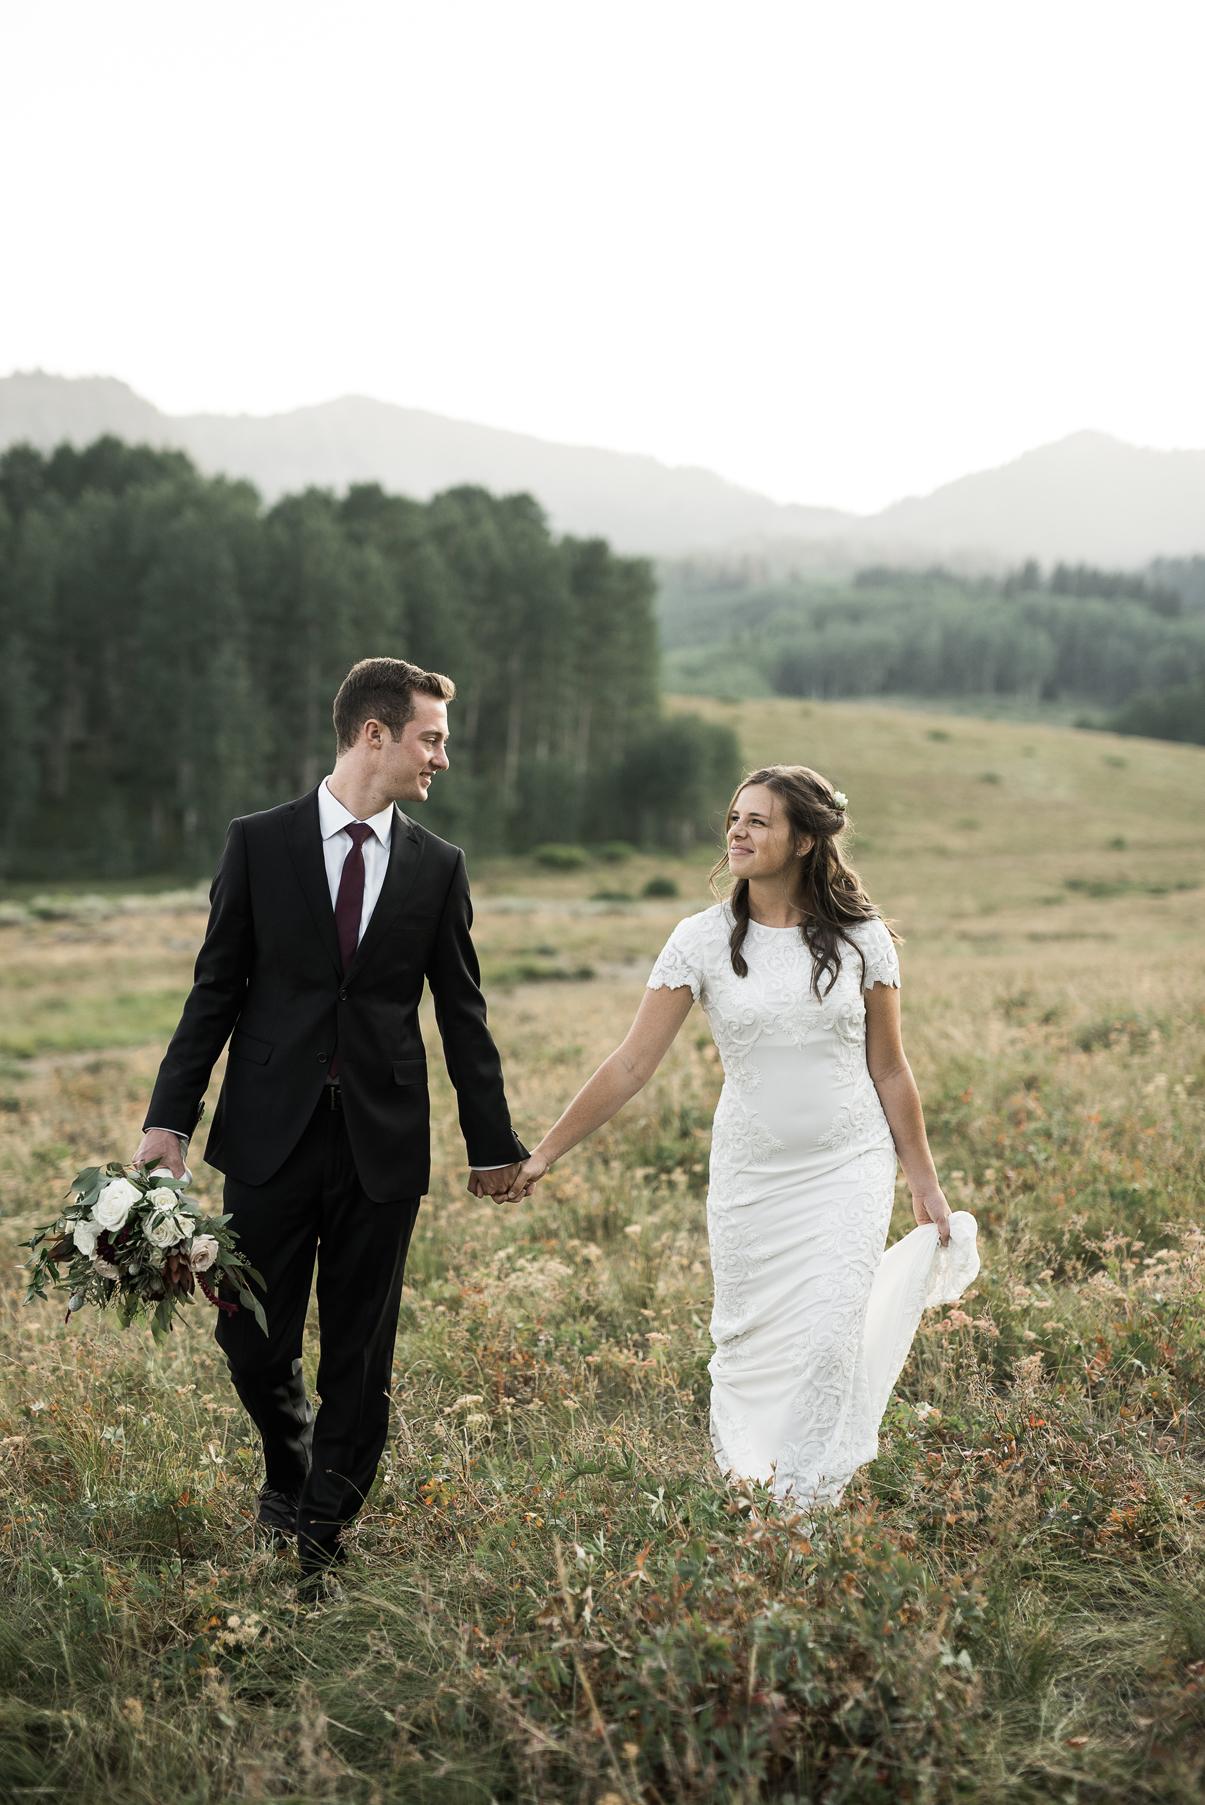 couple walking through open field